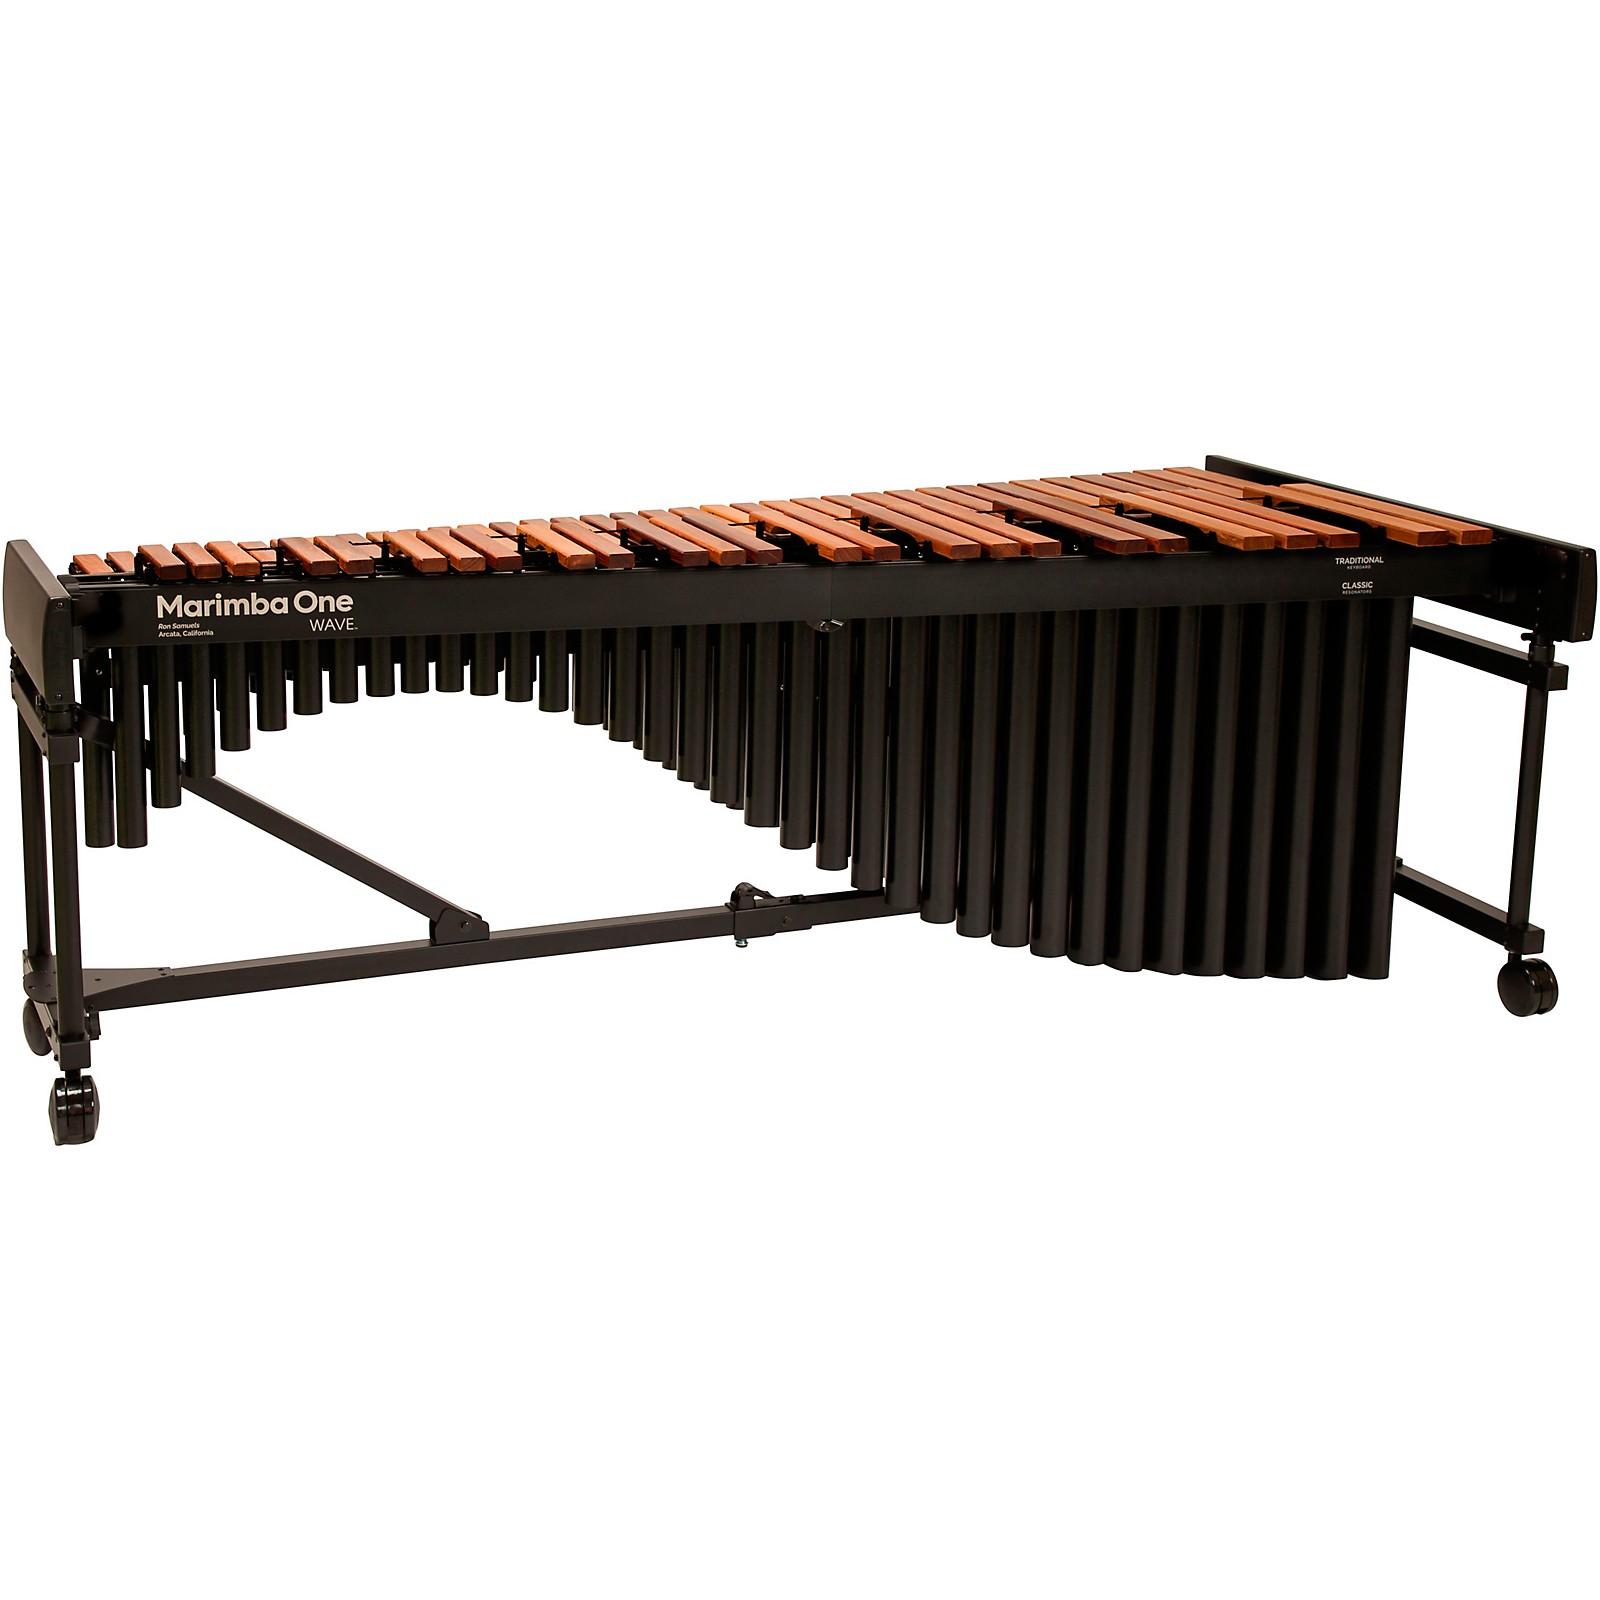 Marimba One Wave #9606 A442 5.0 Octave Marimba with Premium Keyboard and Basso Bravo Resonators 4